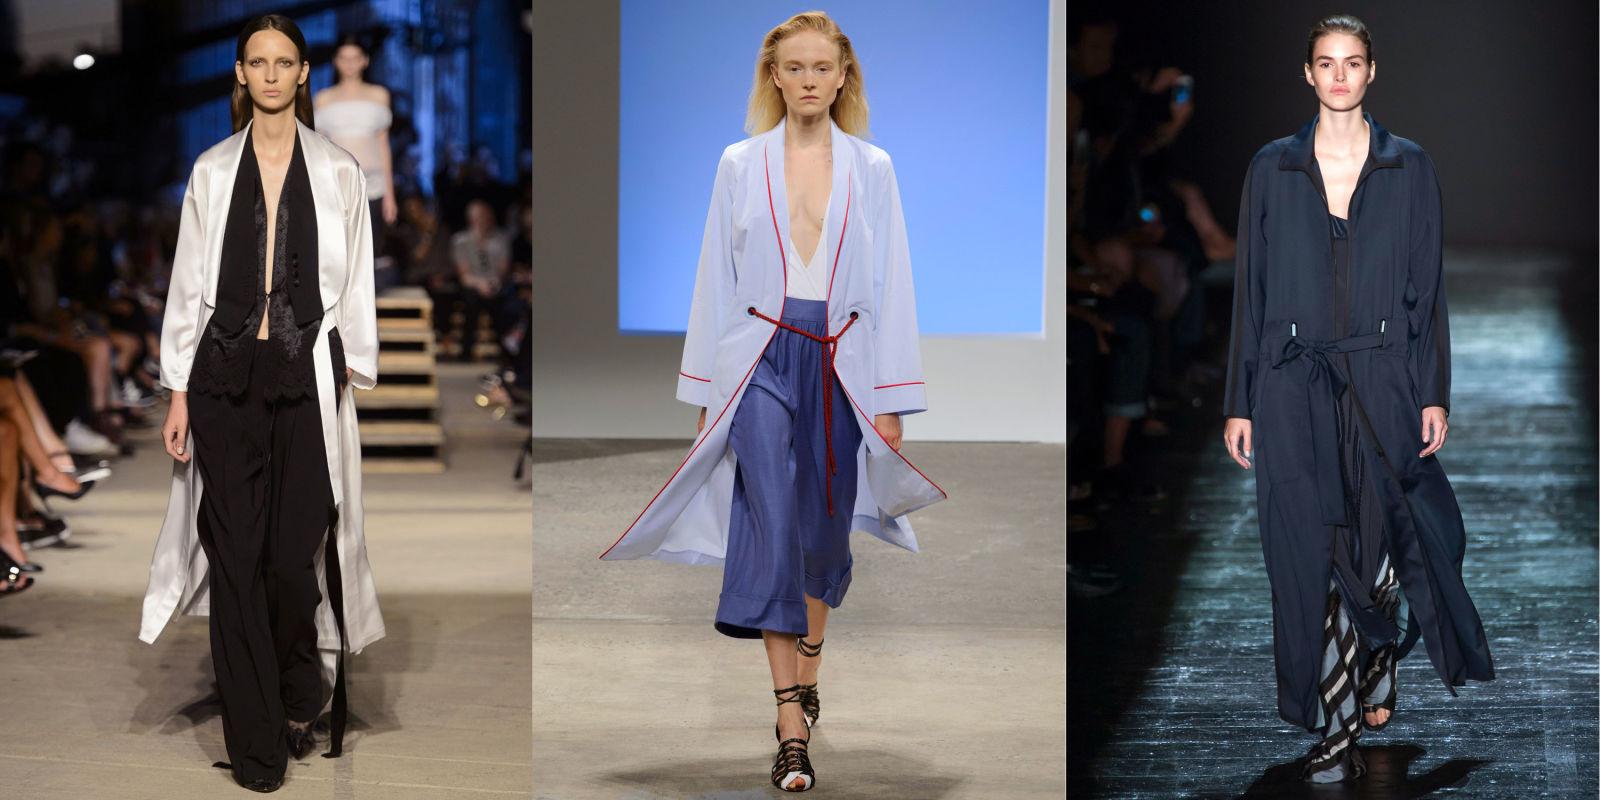 Givenchy, Takoon, and Public School